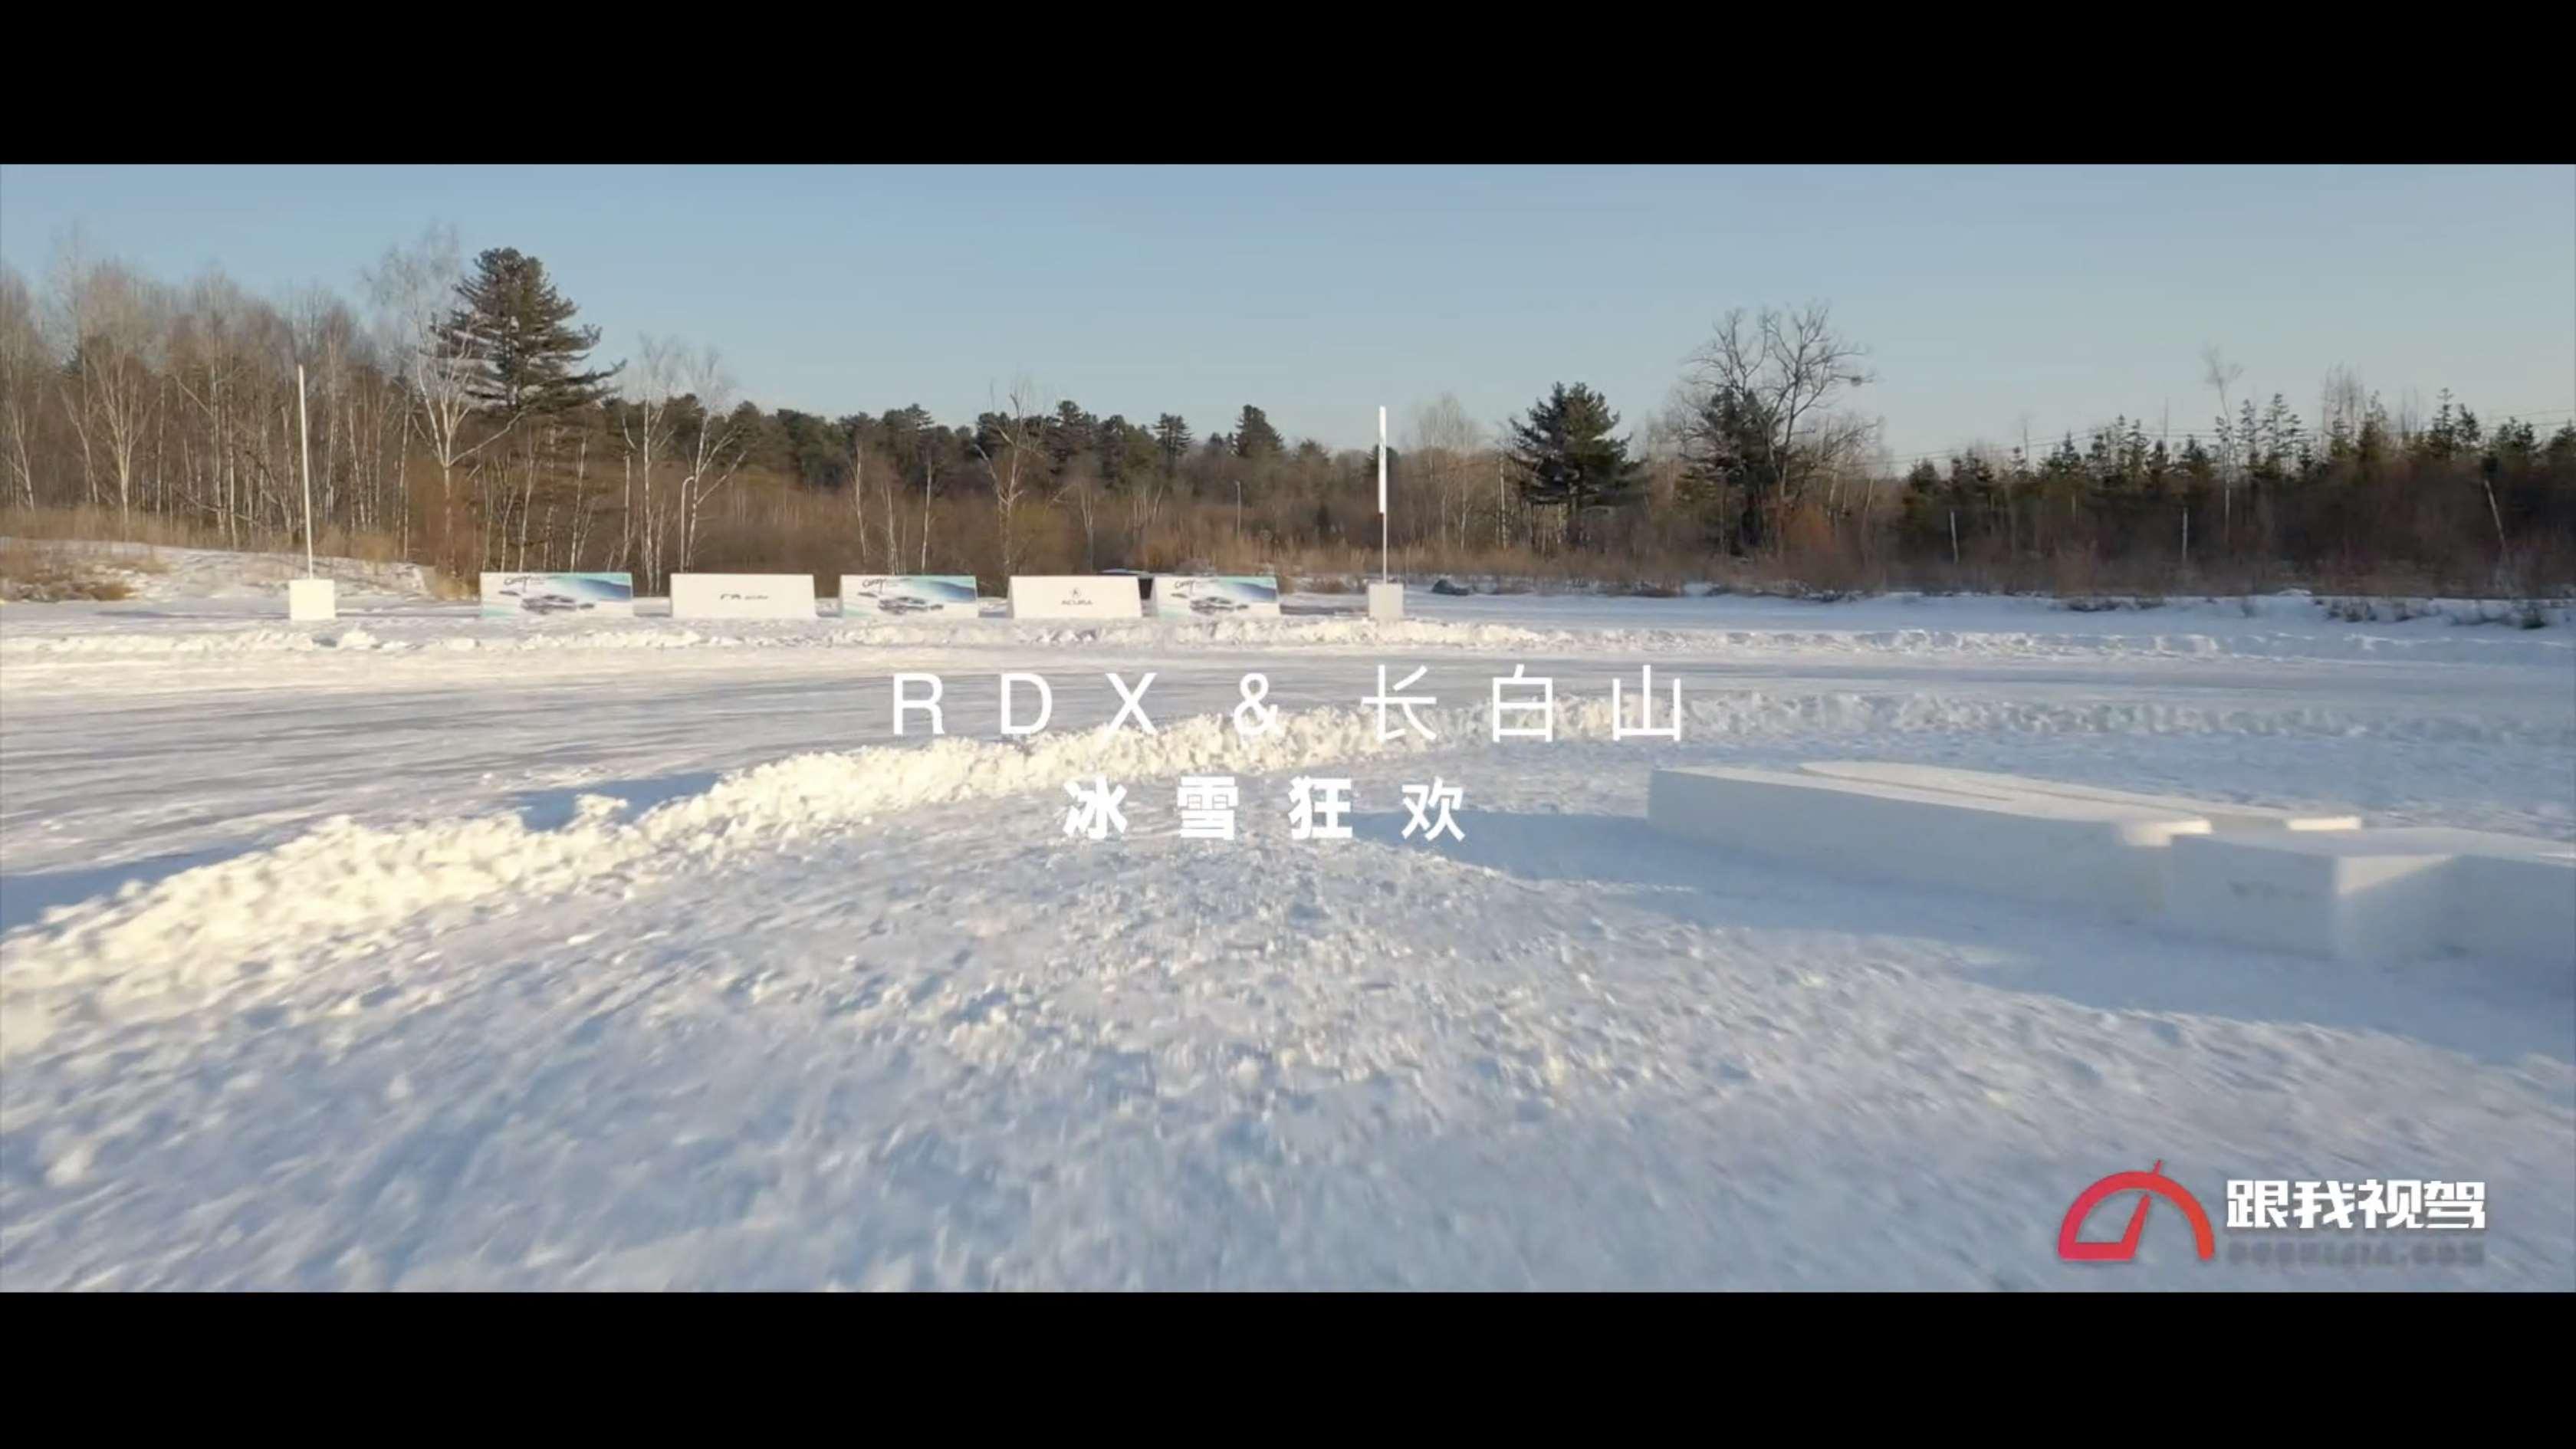 RDX的圣舞冰雪狂欢 Super Handling的完美演绎